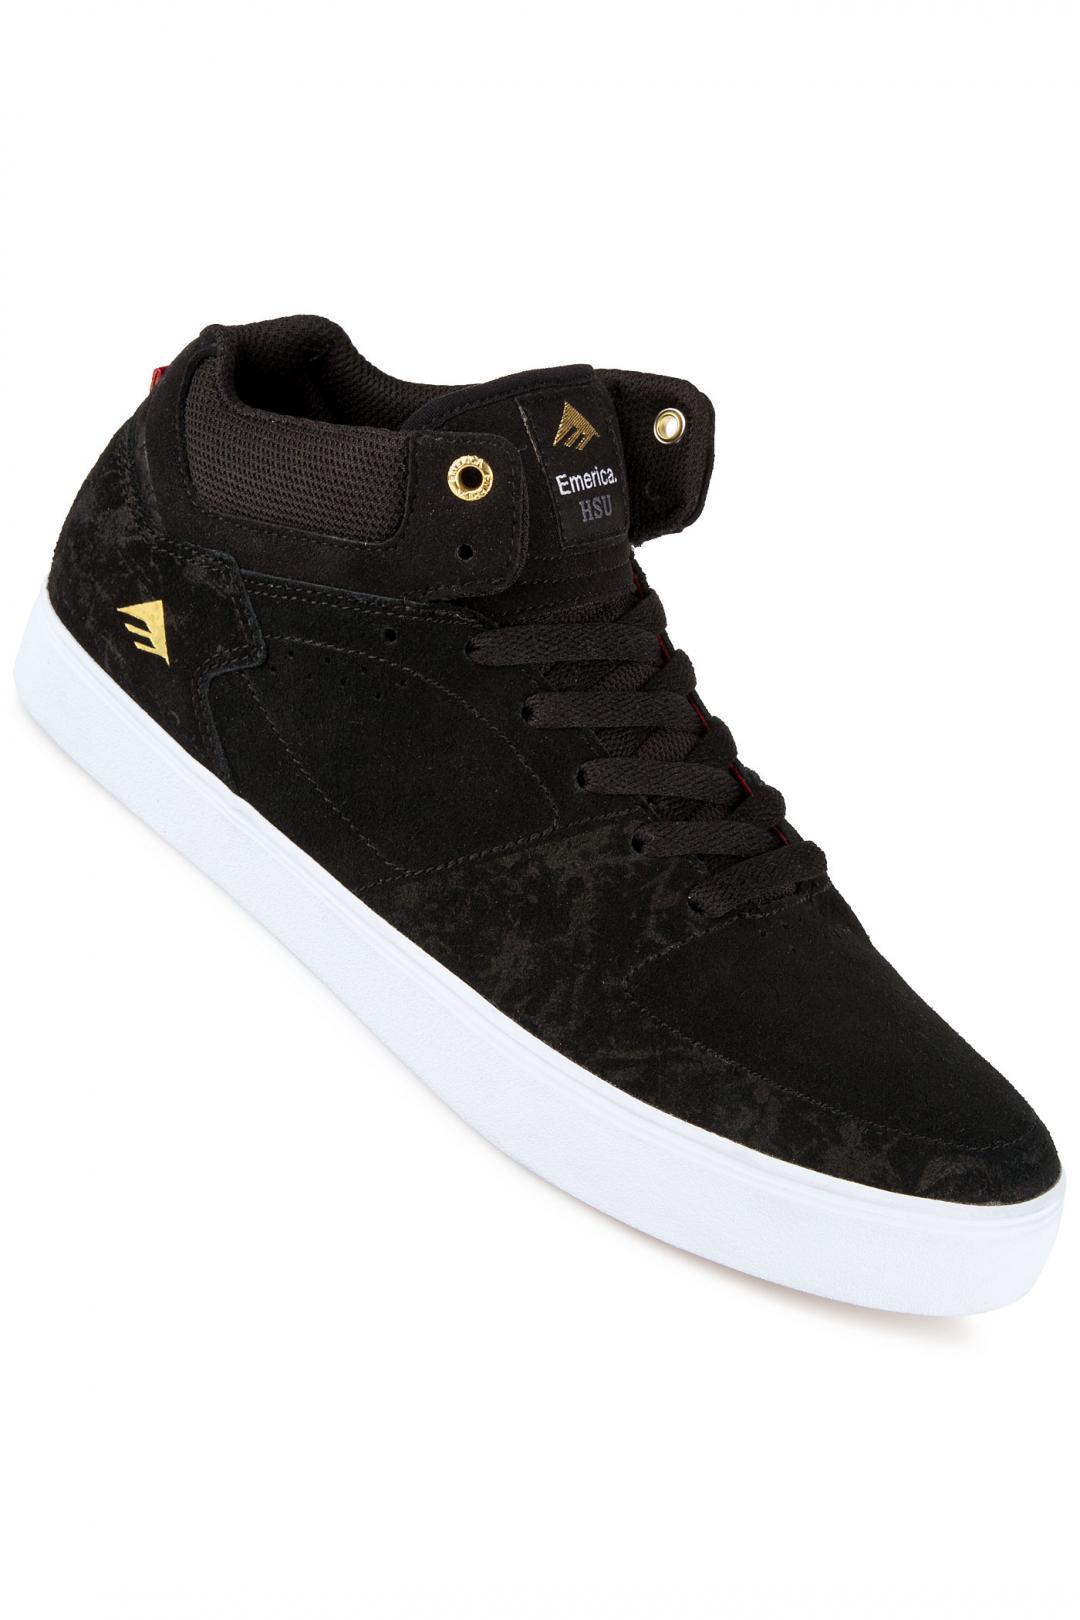 Uomo Emerica The HSU G6 black white | Scarpe da skate